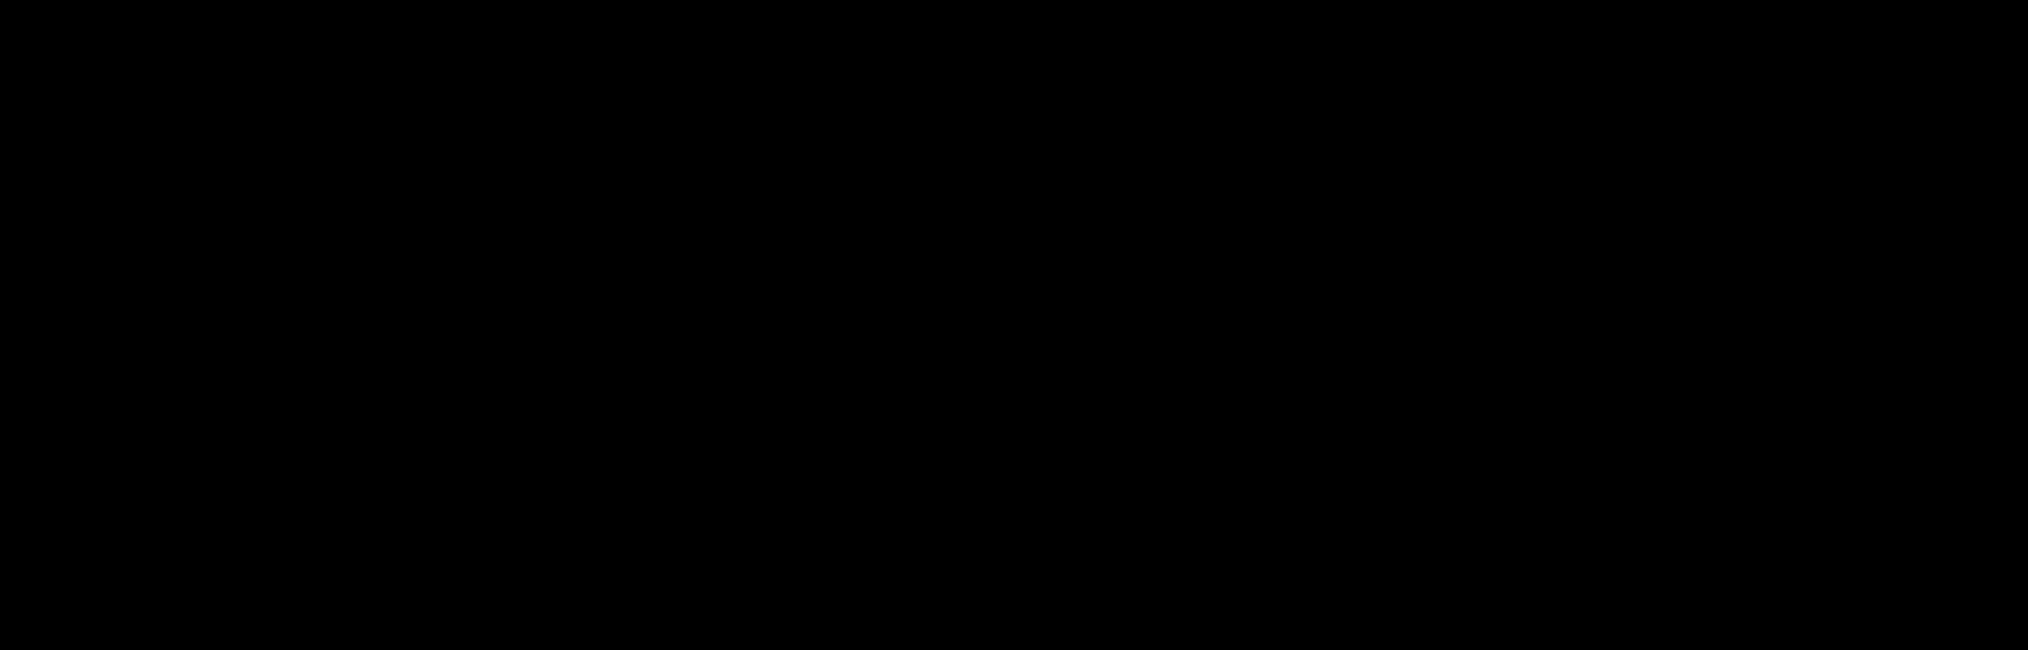 Bageri Surkultur Logotyp